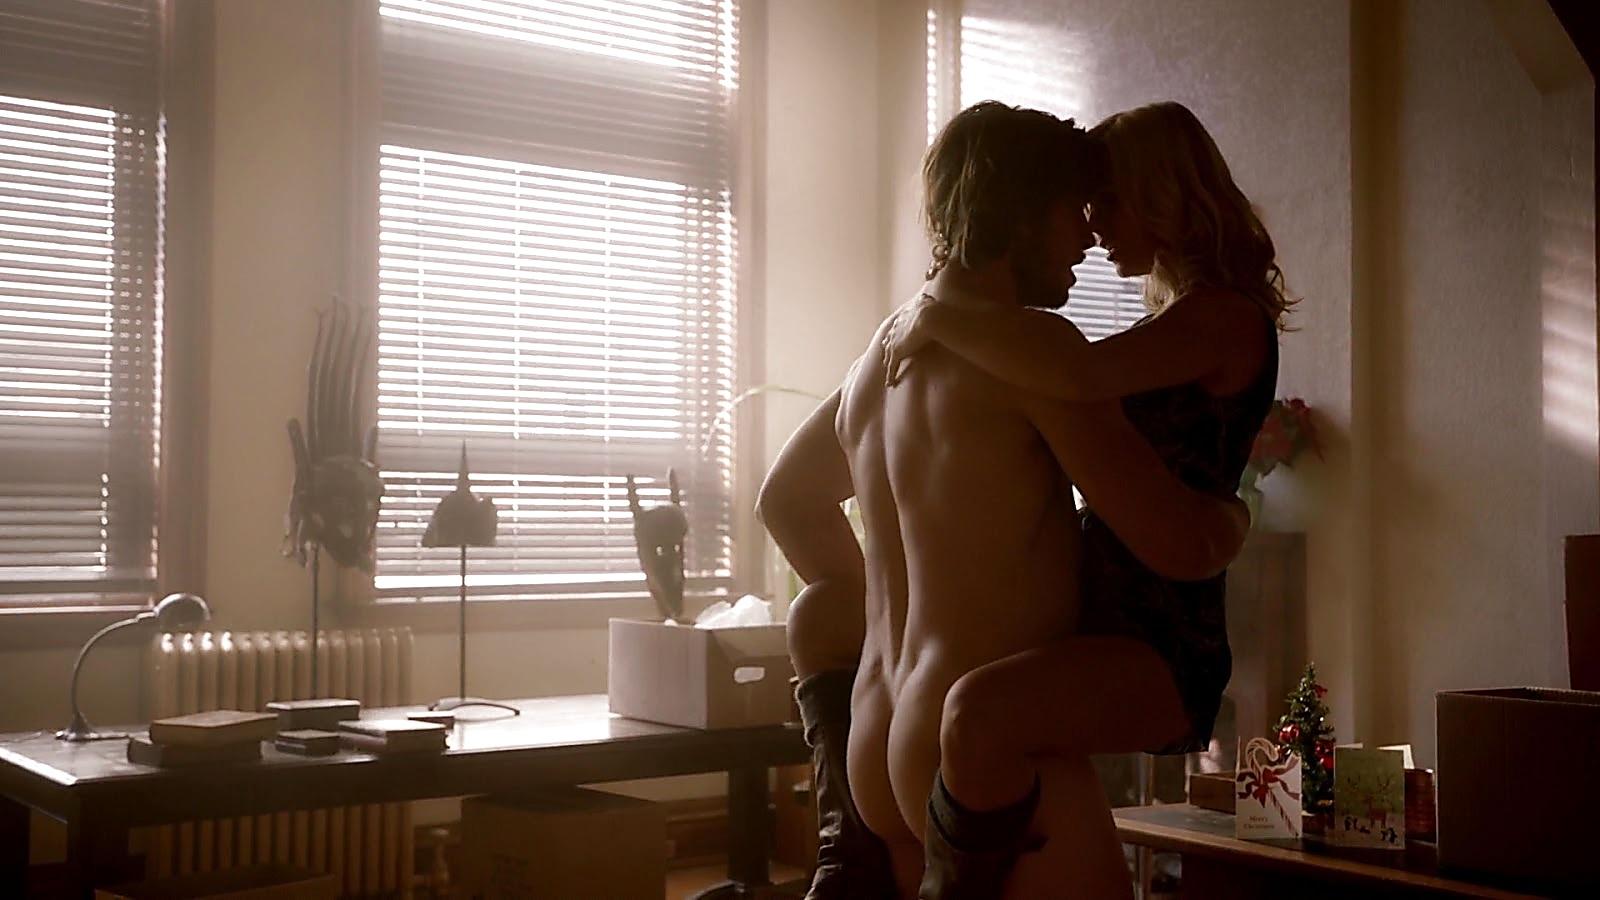 Greyston Holt sexy shirtless scene May 3, 2020, 11am